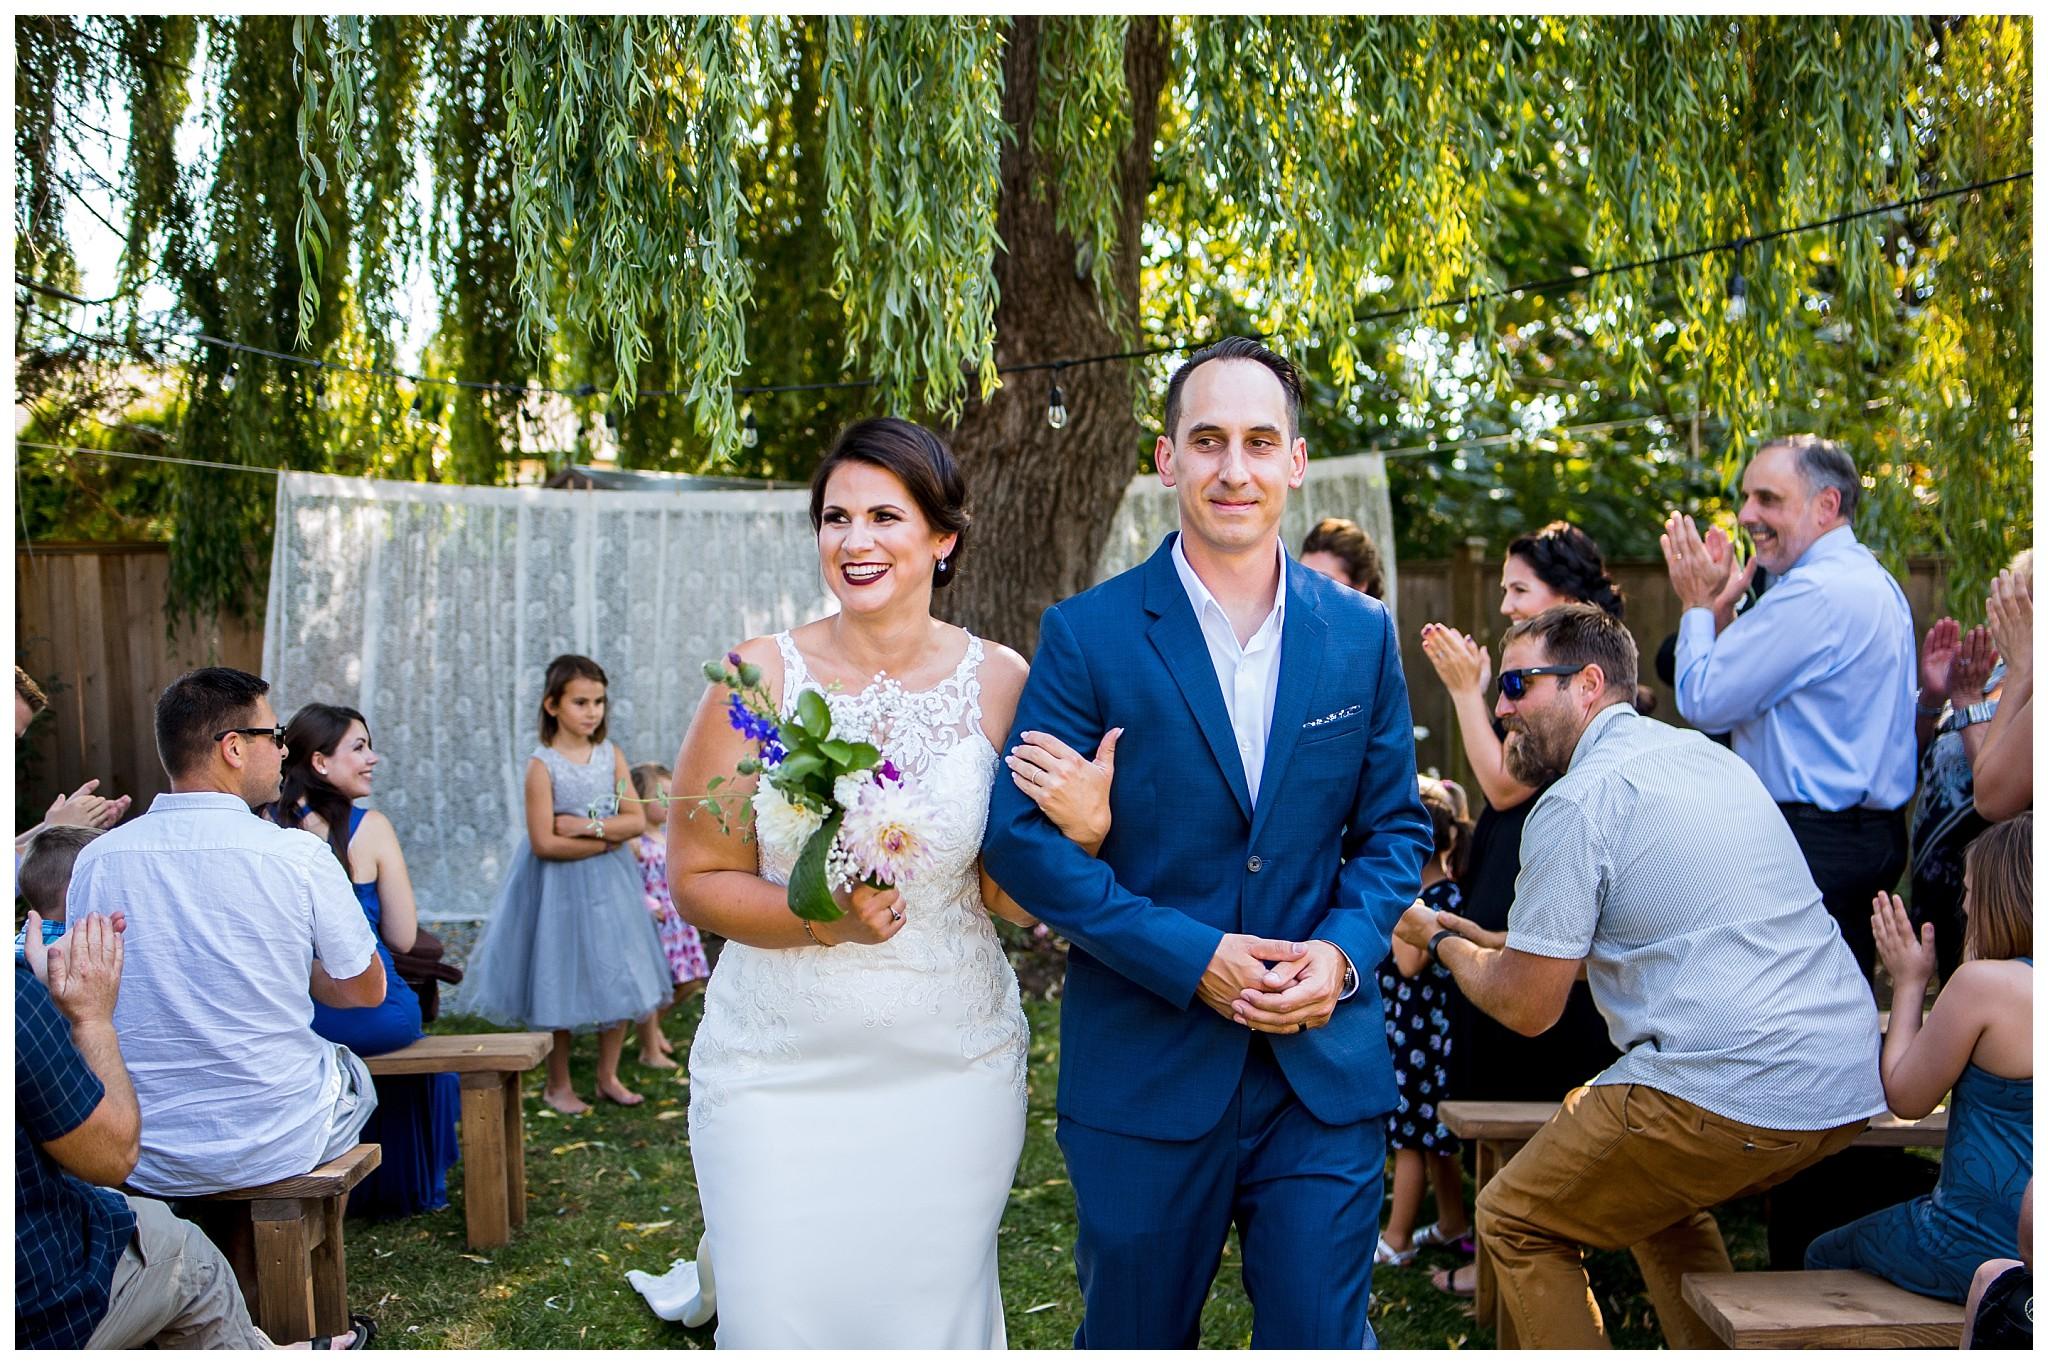 Aldergrove backyard summer wedding photographer bc canada outdoor garden inspiration family couple with kids, bride and groom_0060.jpg